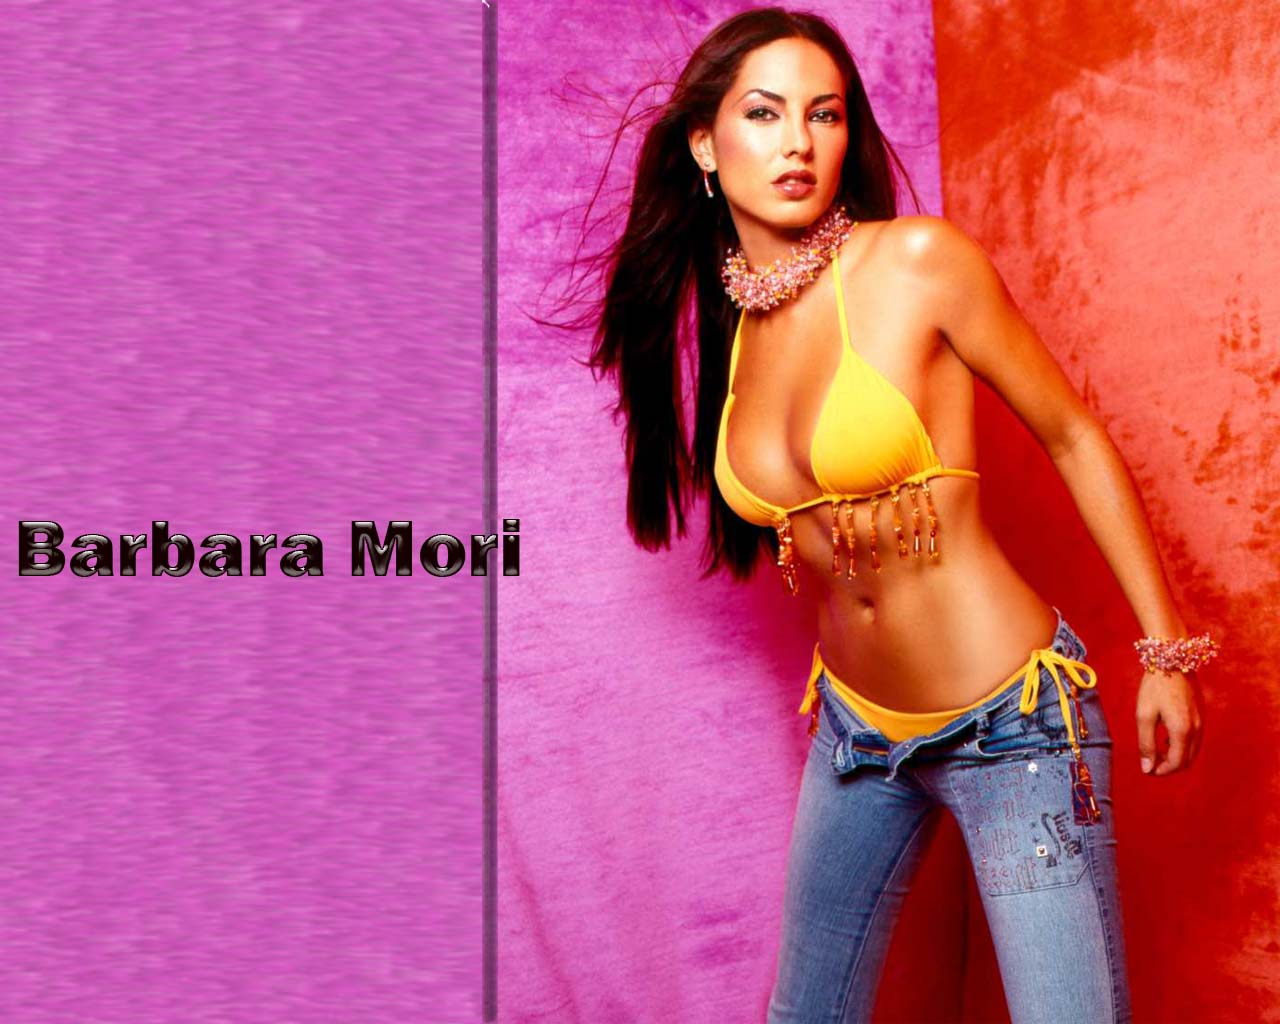 Movies Mix: Barbara Mori